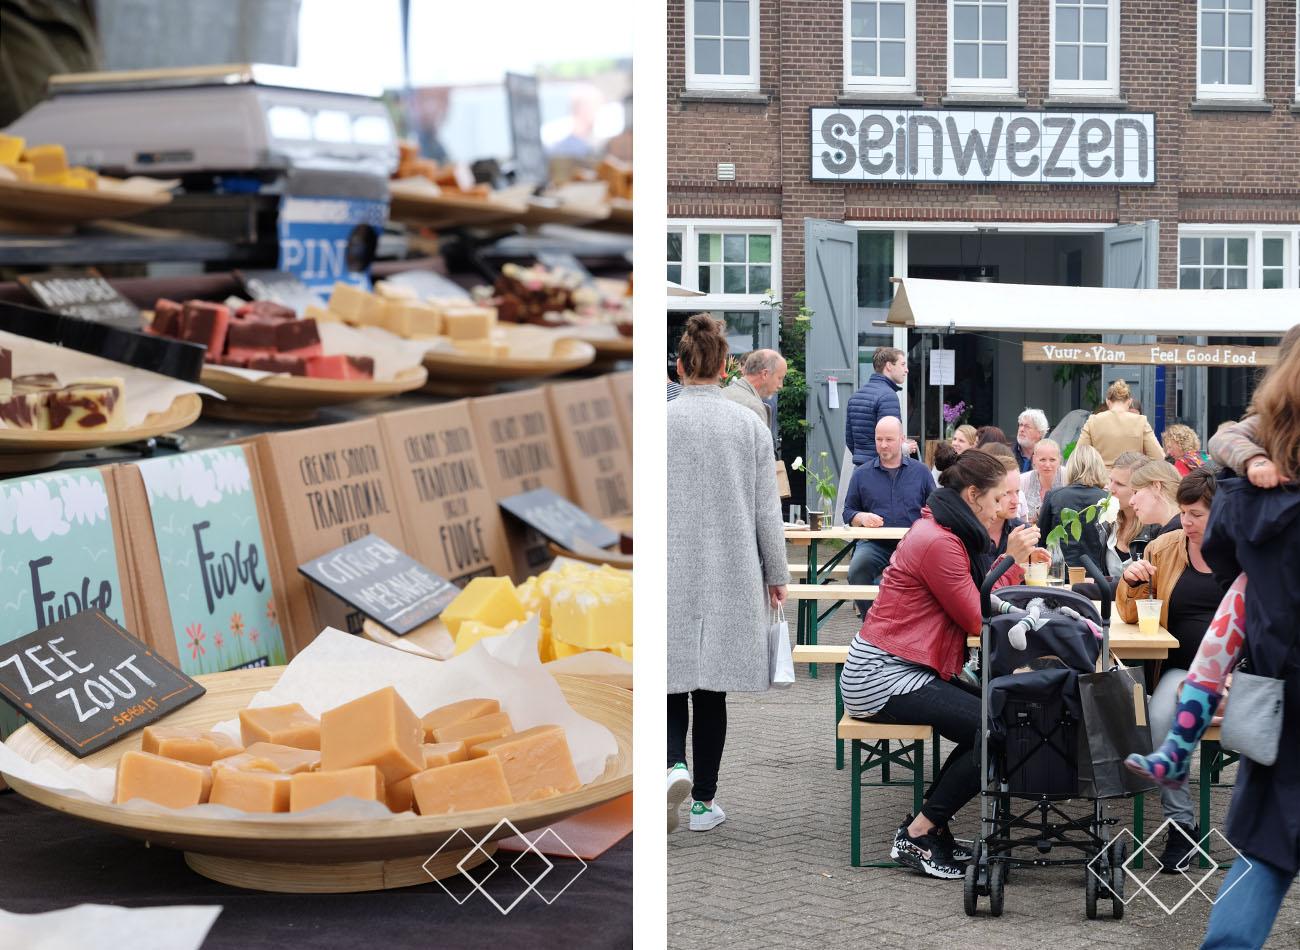 Seinfestijn 2 - staand